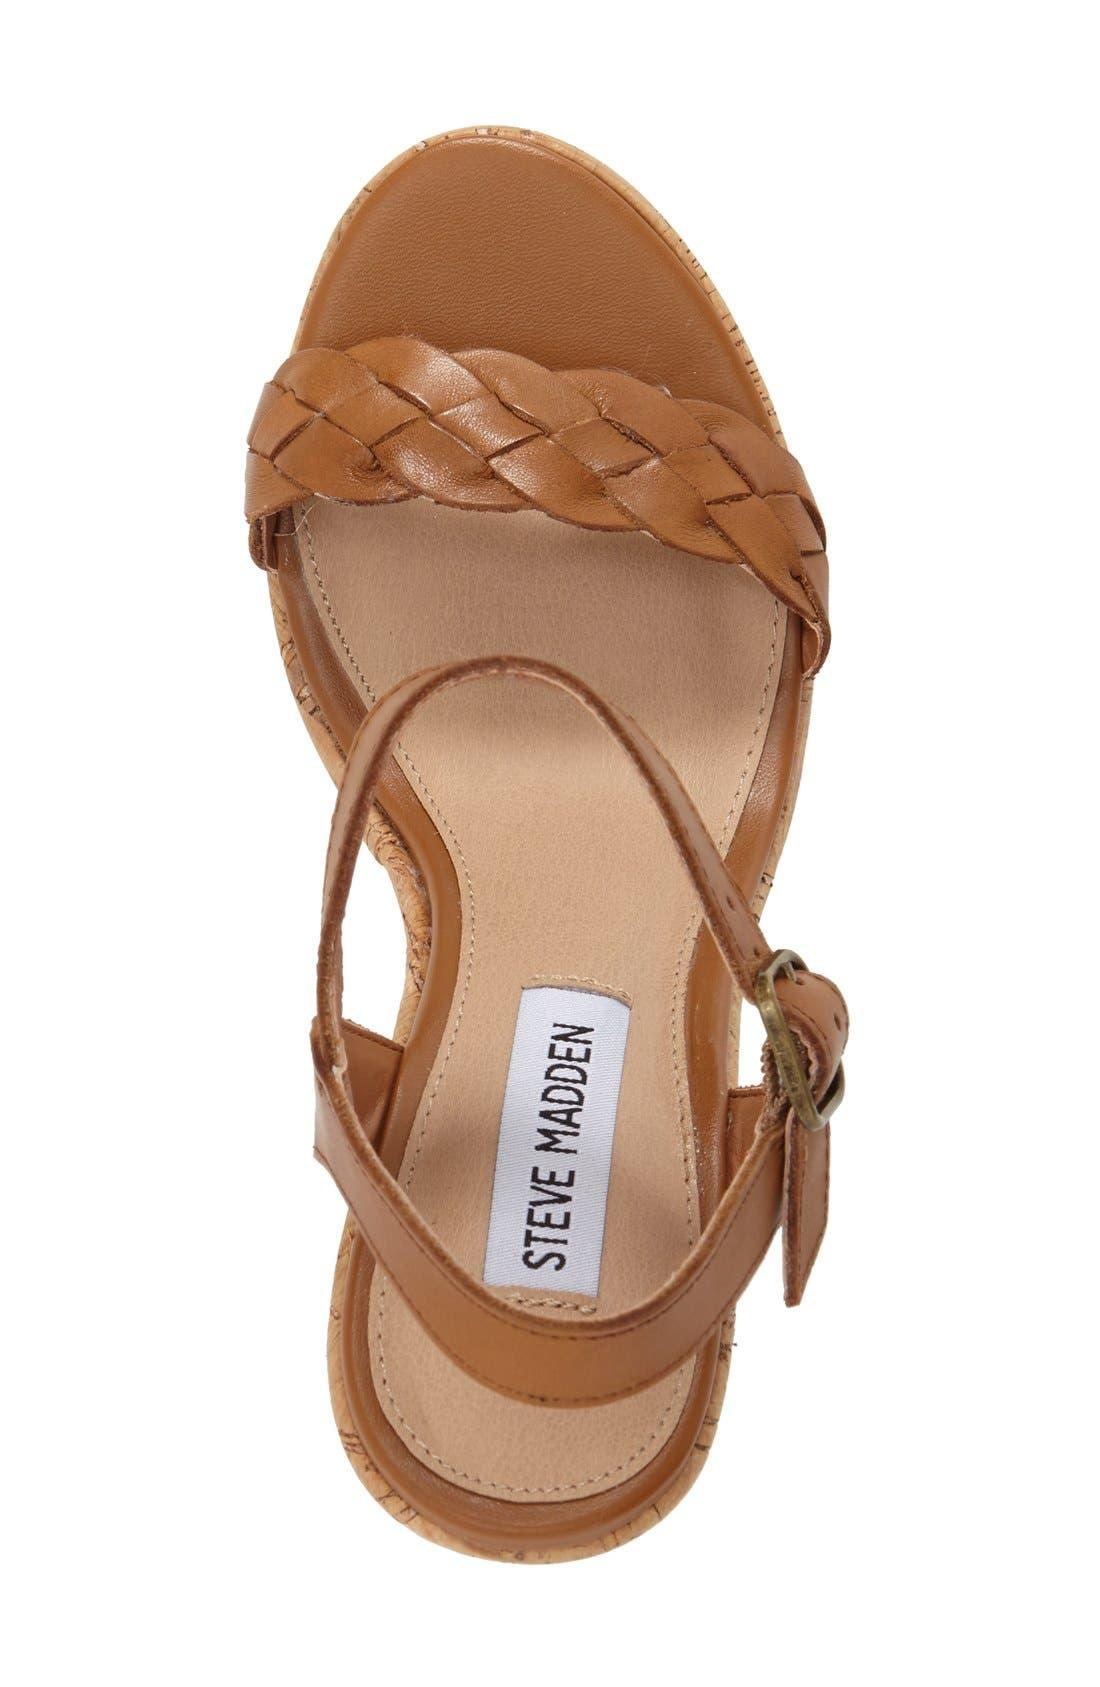 Alternate Image 3  - Steve Madden 'Emmey' Platform Wedge Sandal (Women)